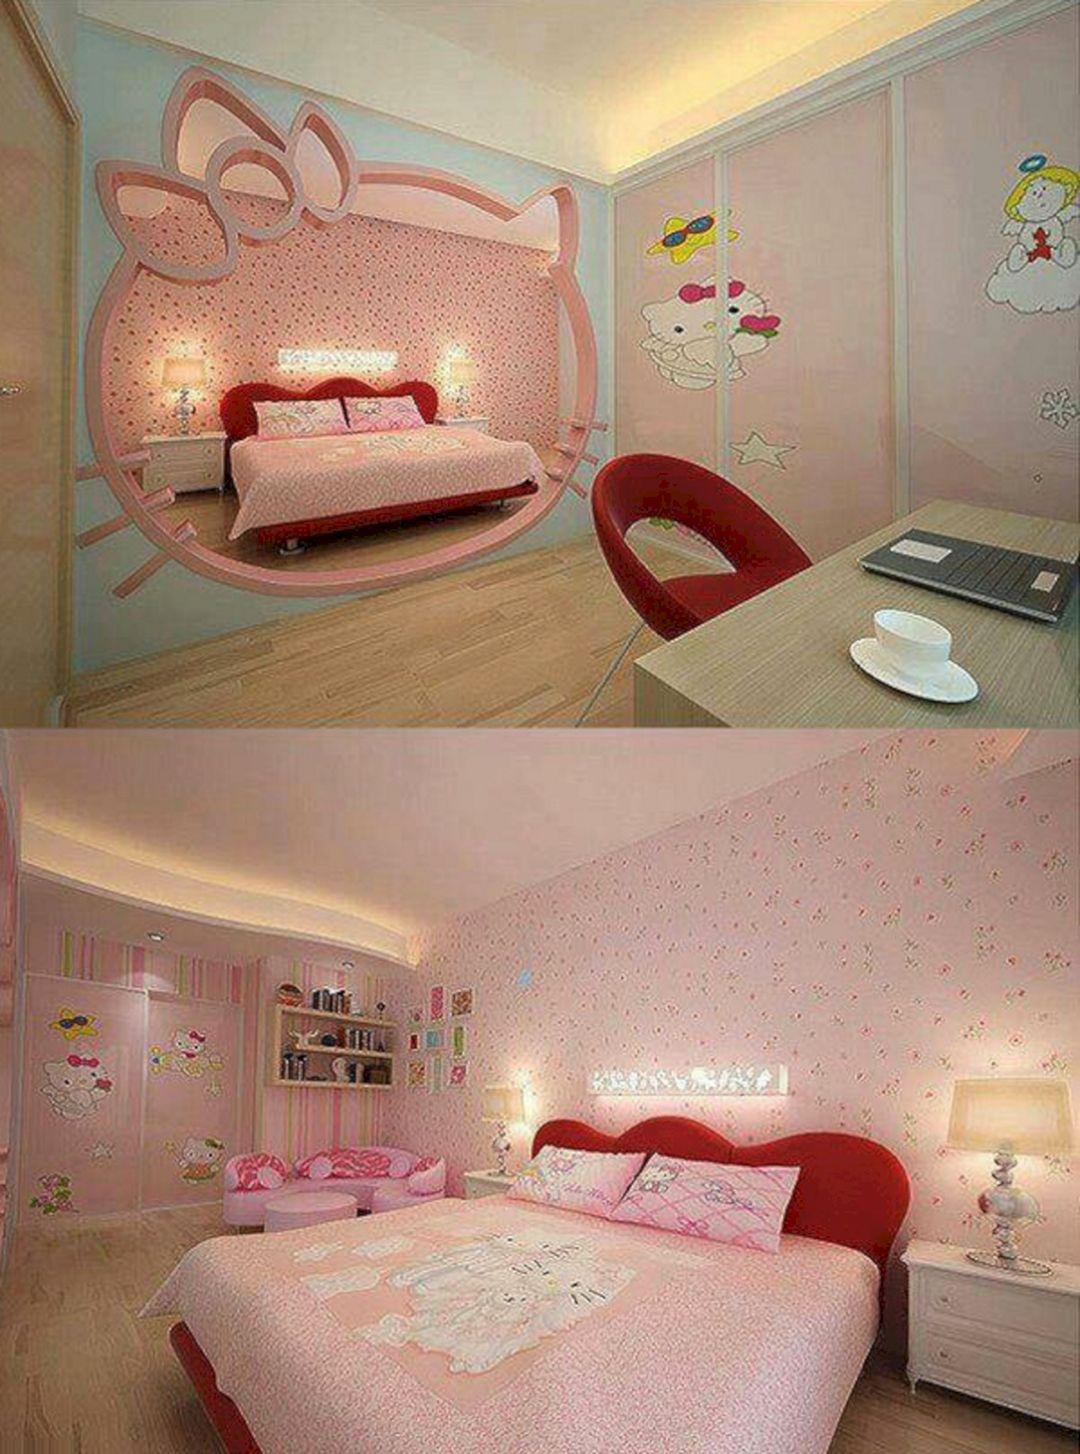 appealing hello kitty living room | Hello Kitty Room Design (Hello Kitty Room Design) design ...